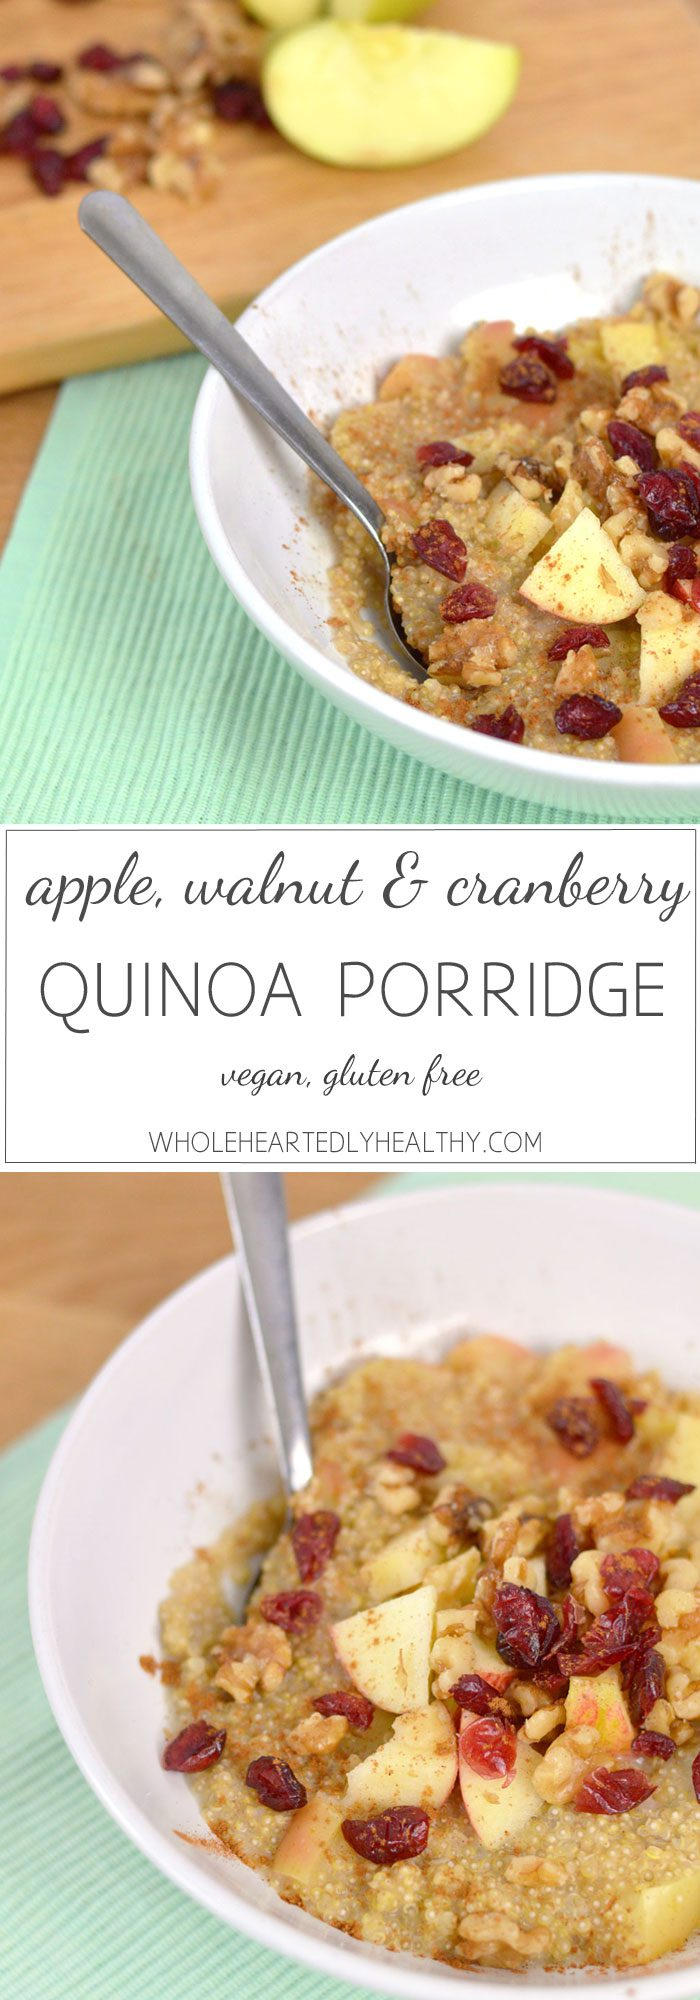 Apple walnut and cranberry quinoa porridge